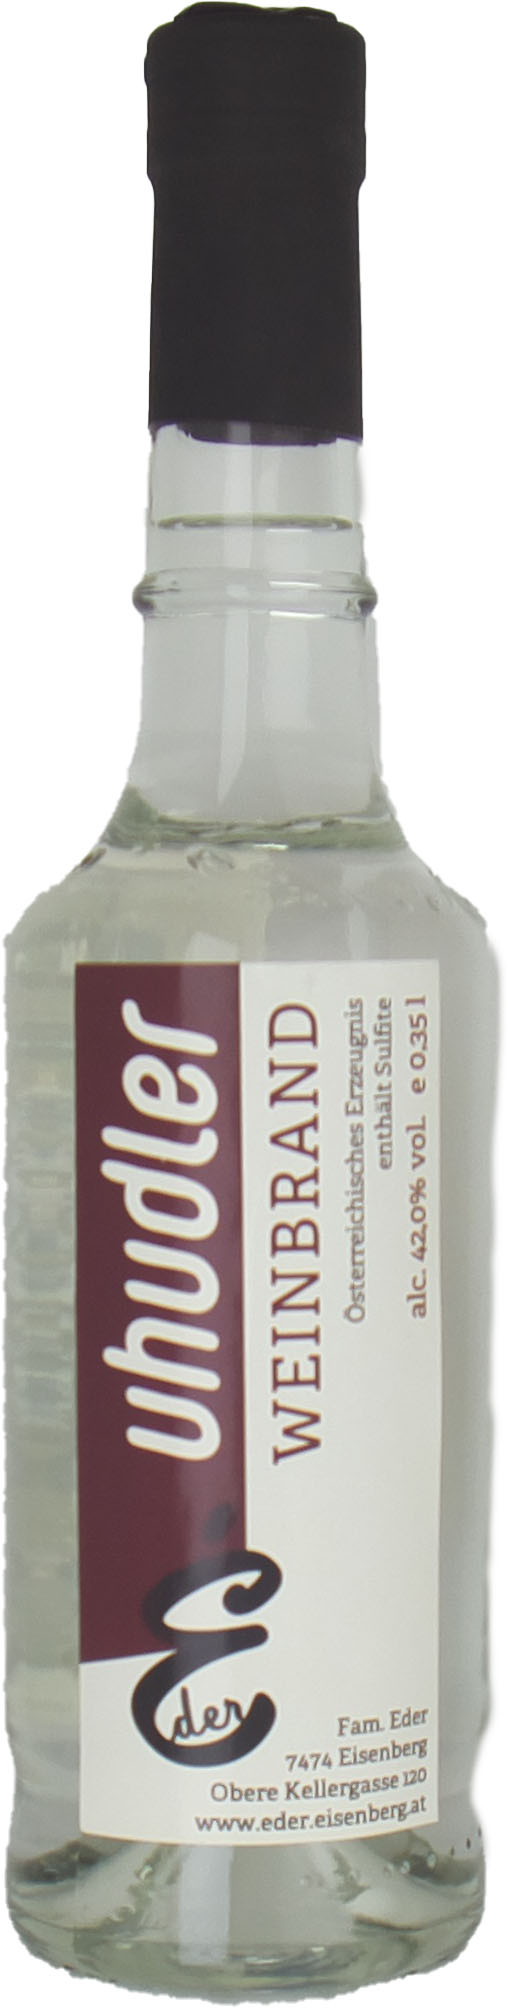 Uhudler Traubenbrand 0,35 l